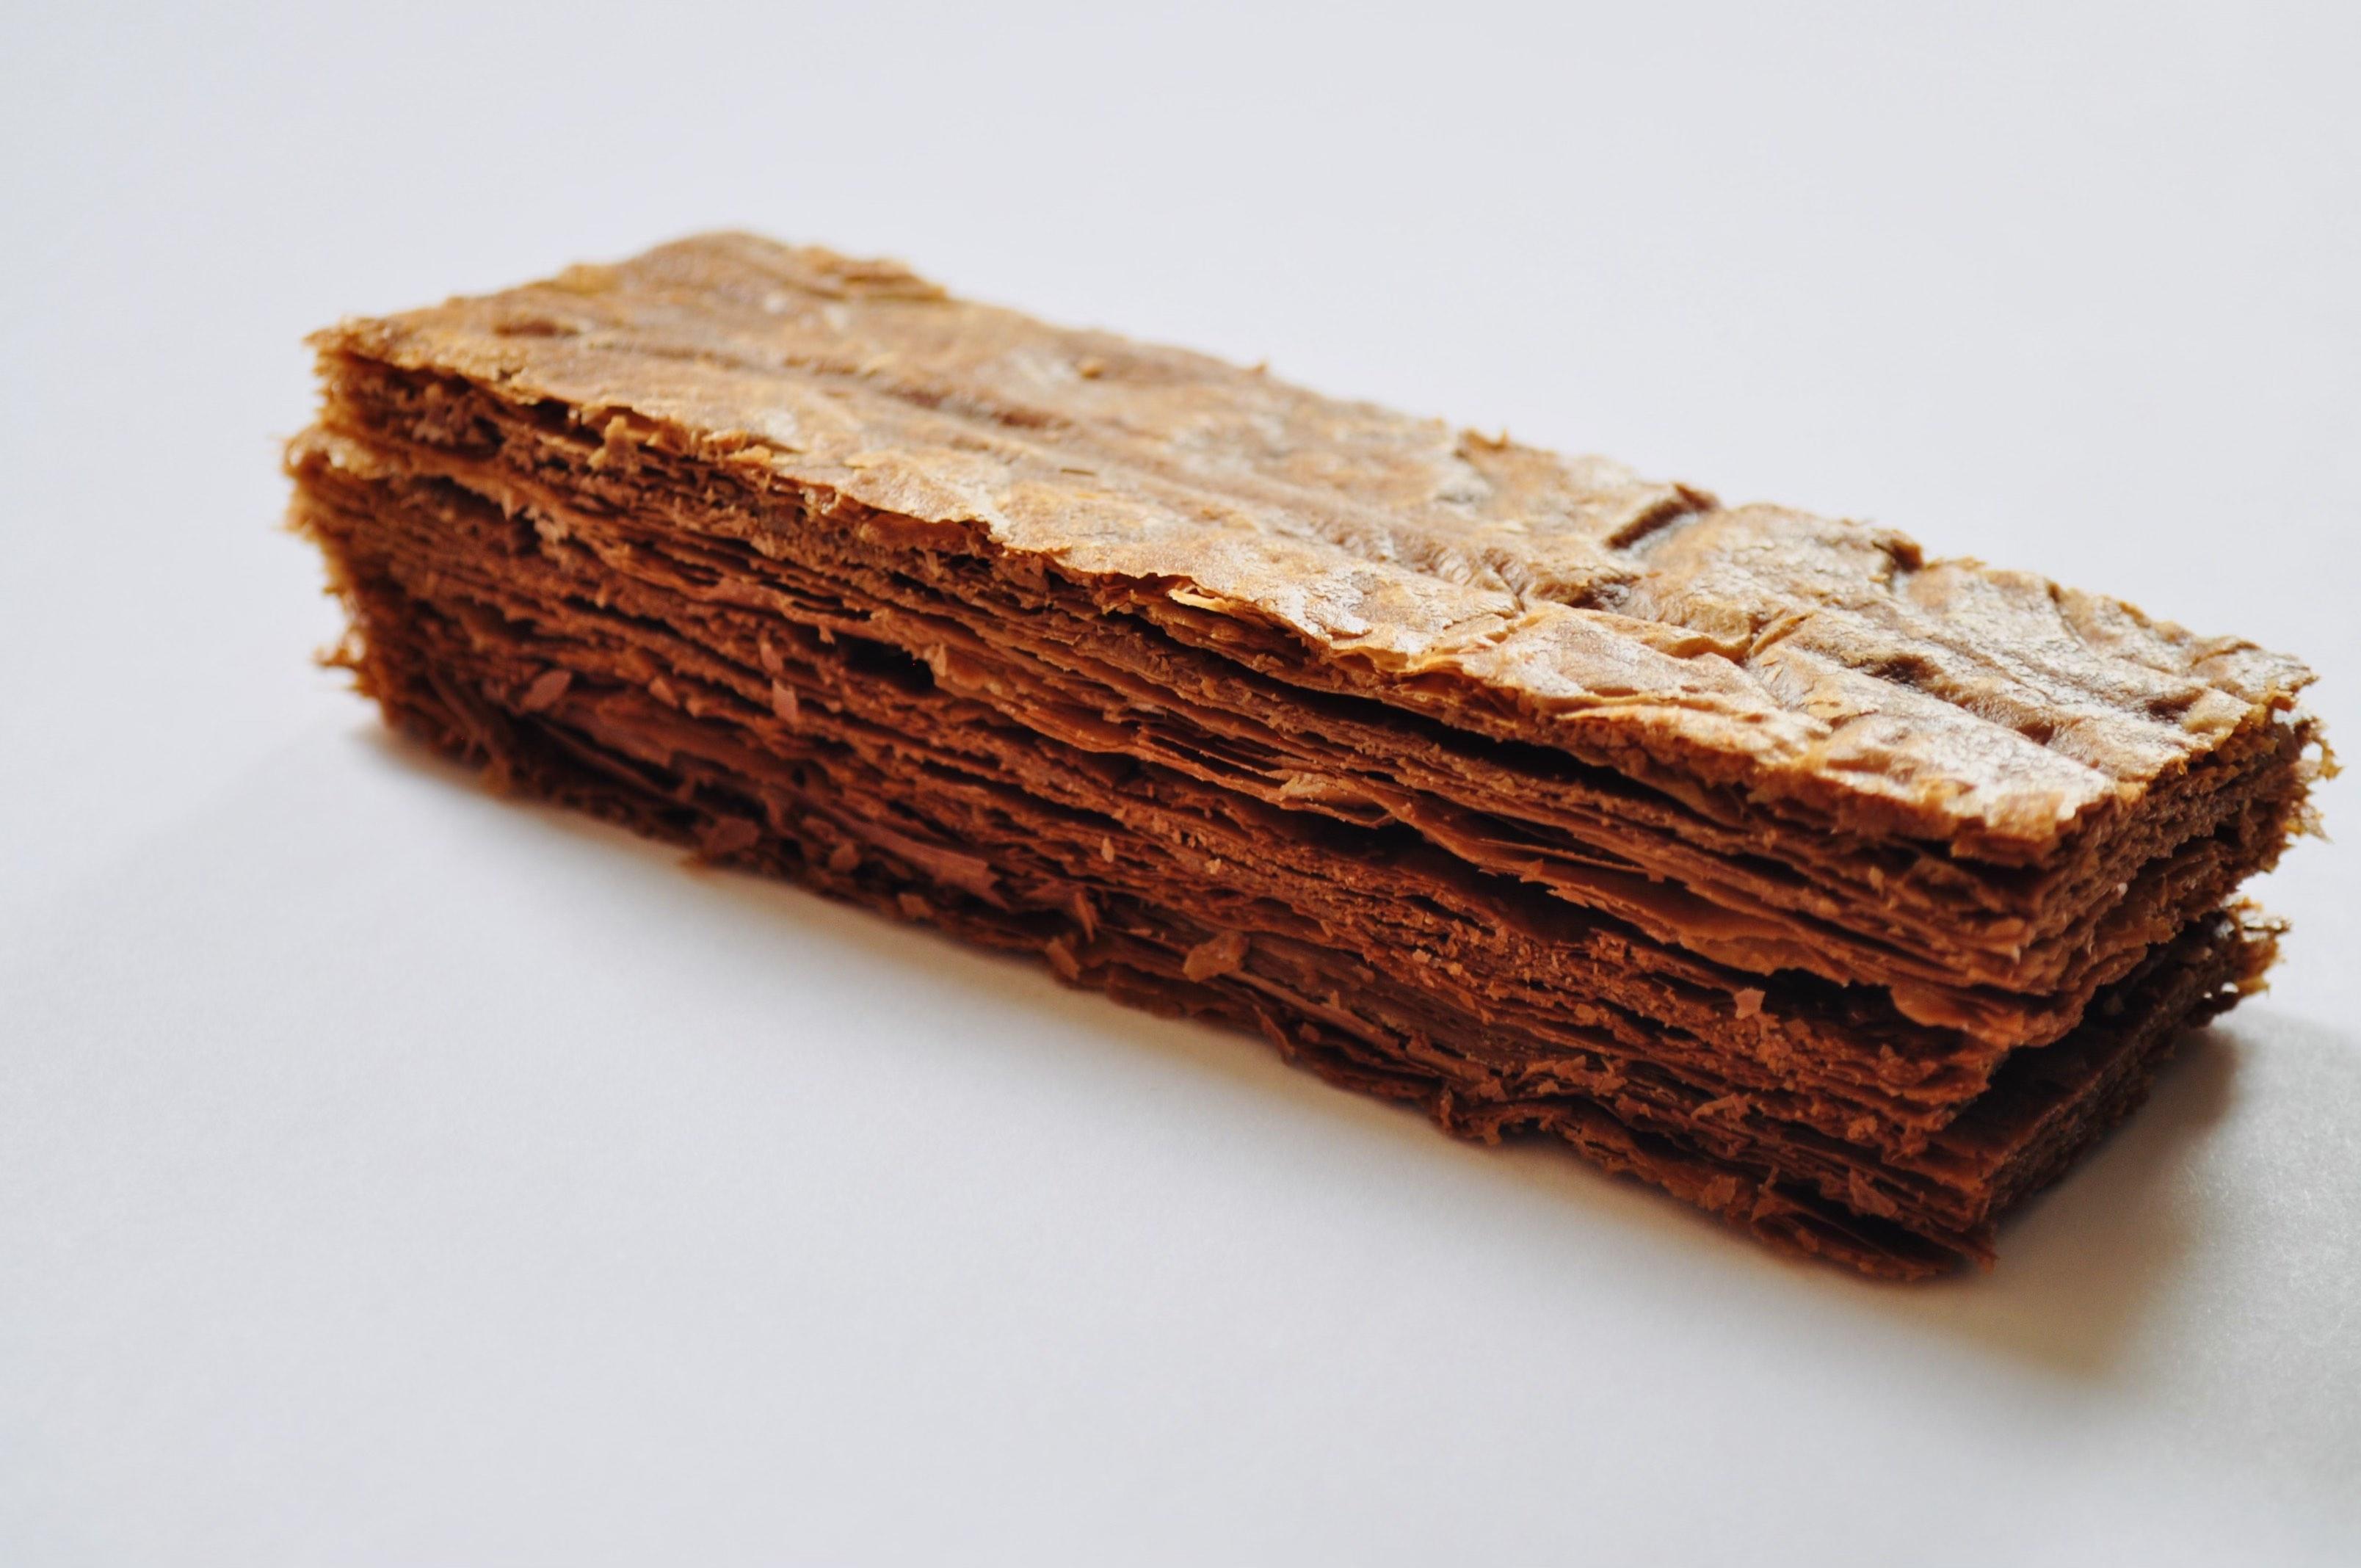 puff pastry with True Dark cocoa powder